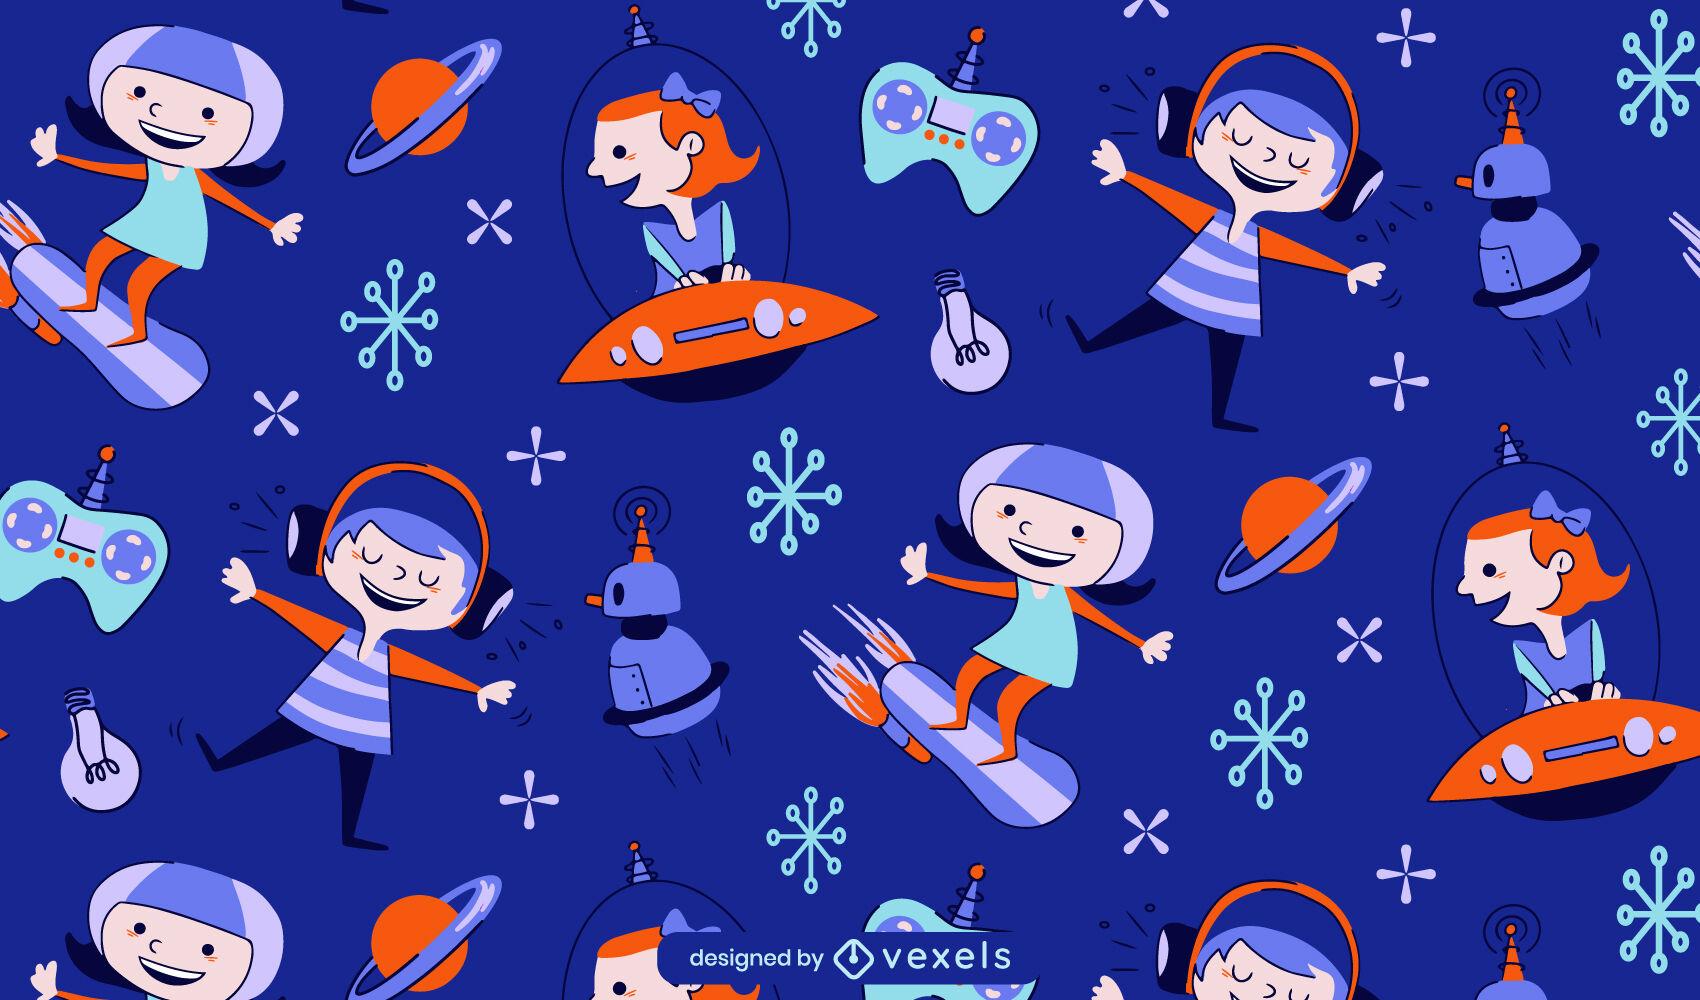 Patrón de dibujos animados retro de niños futuristas